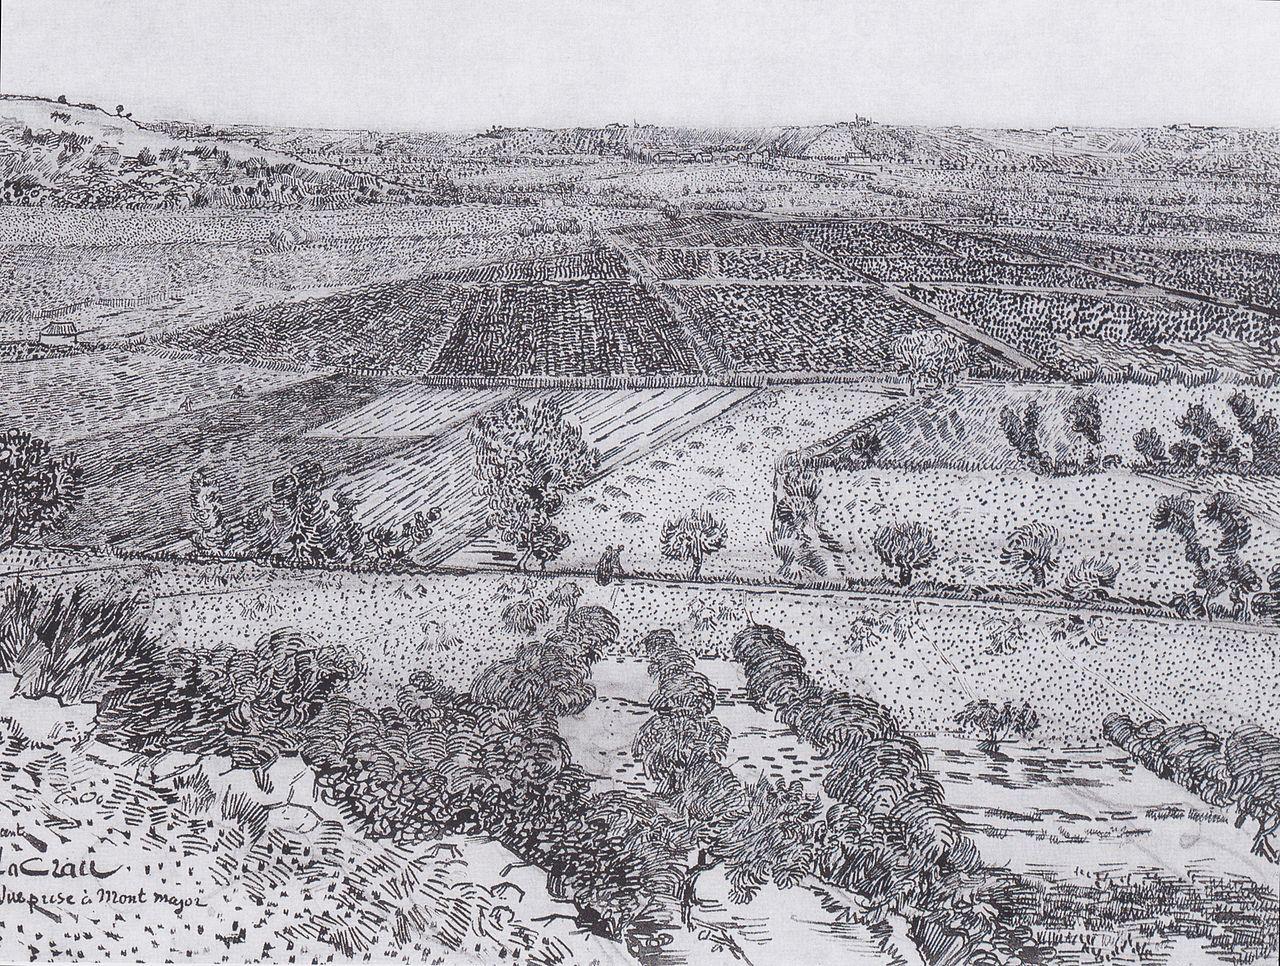 FileVan Gogh Die Ebene La Crau Bei Arles Von